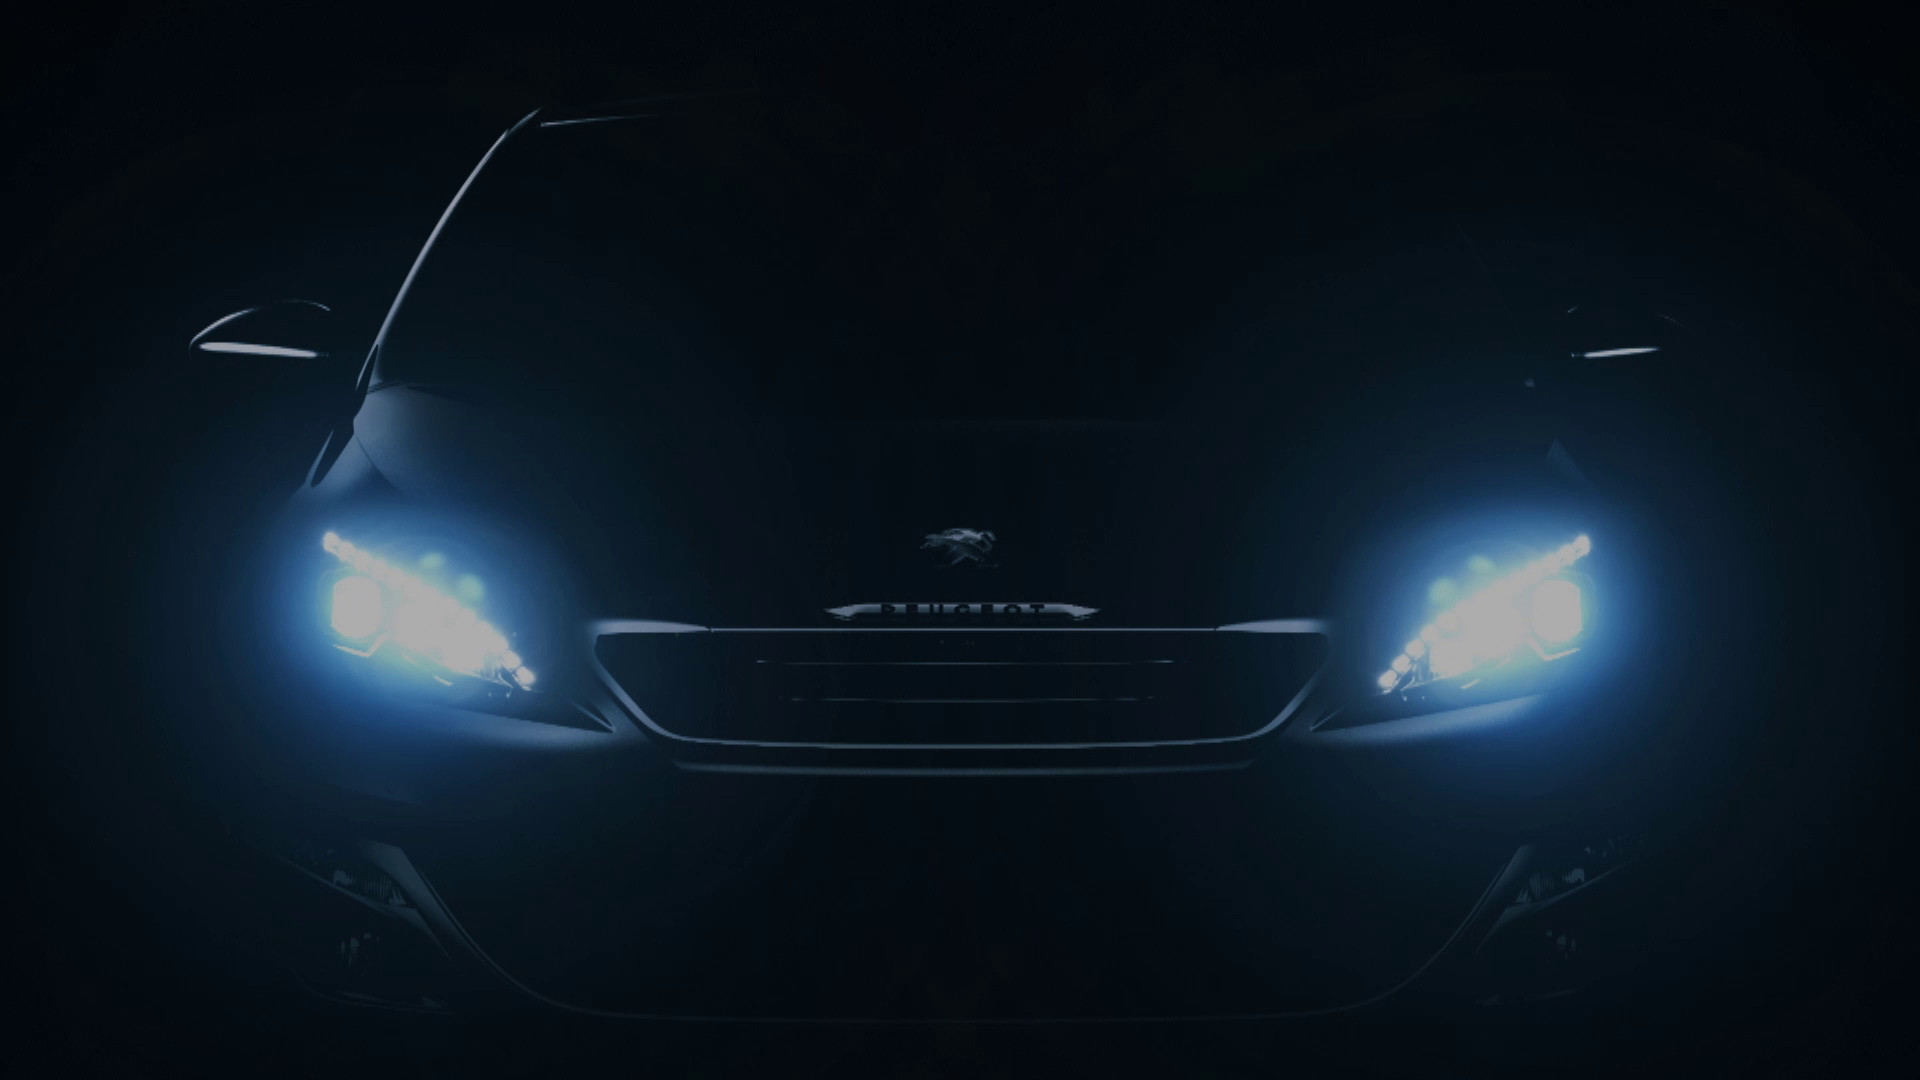 Peugeot 308 Frontansicht